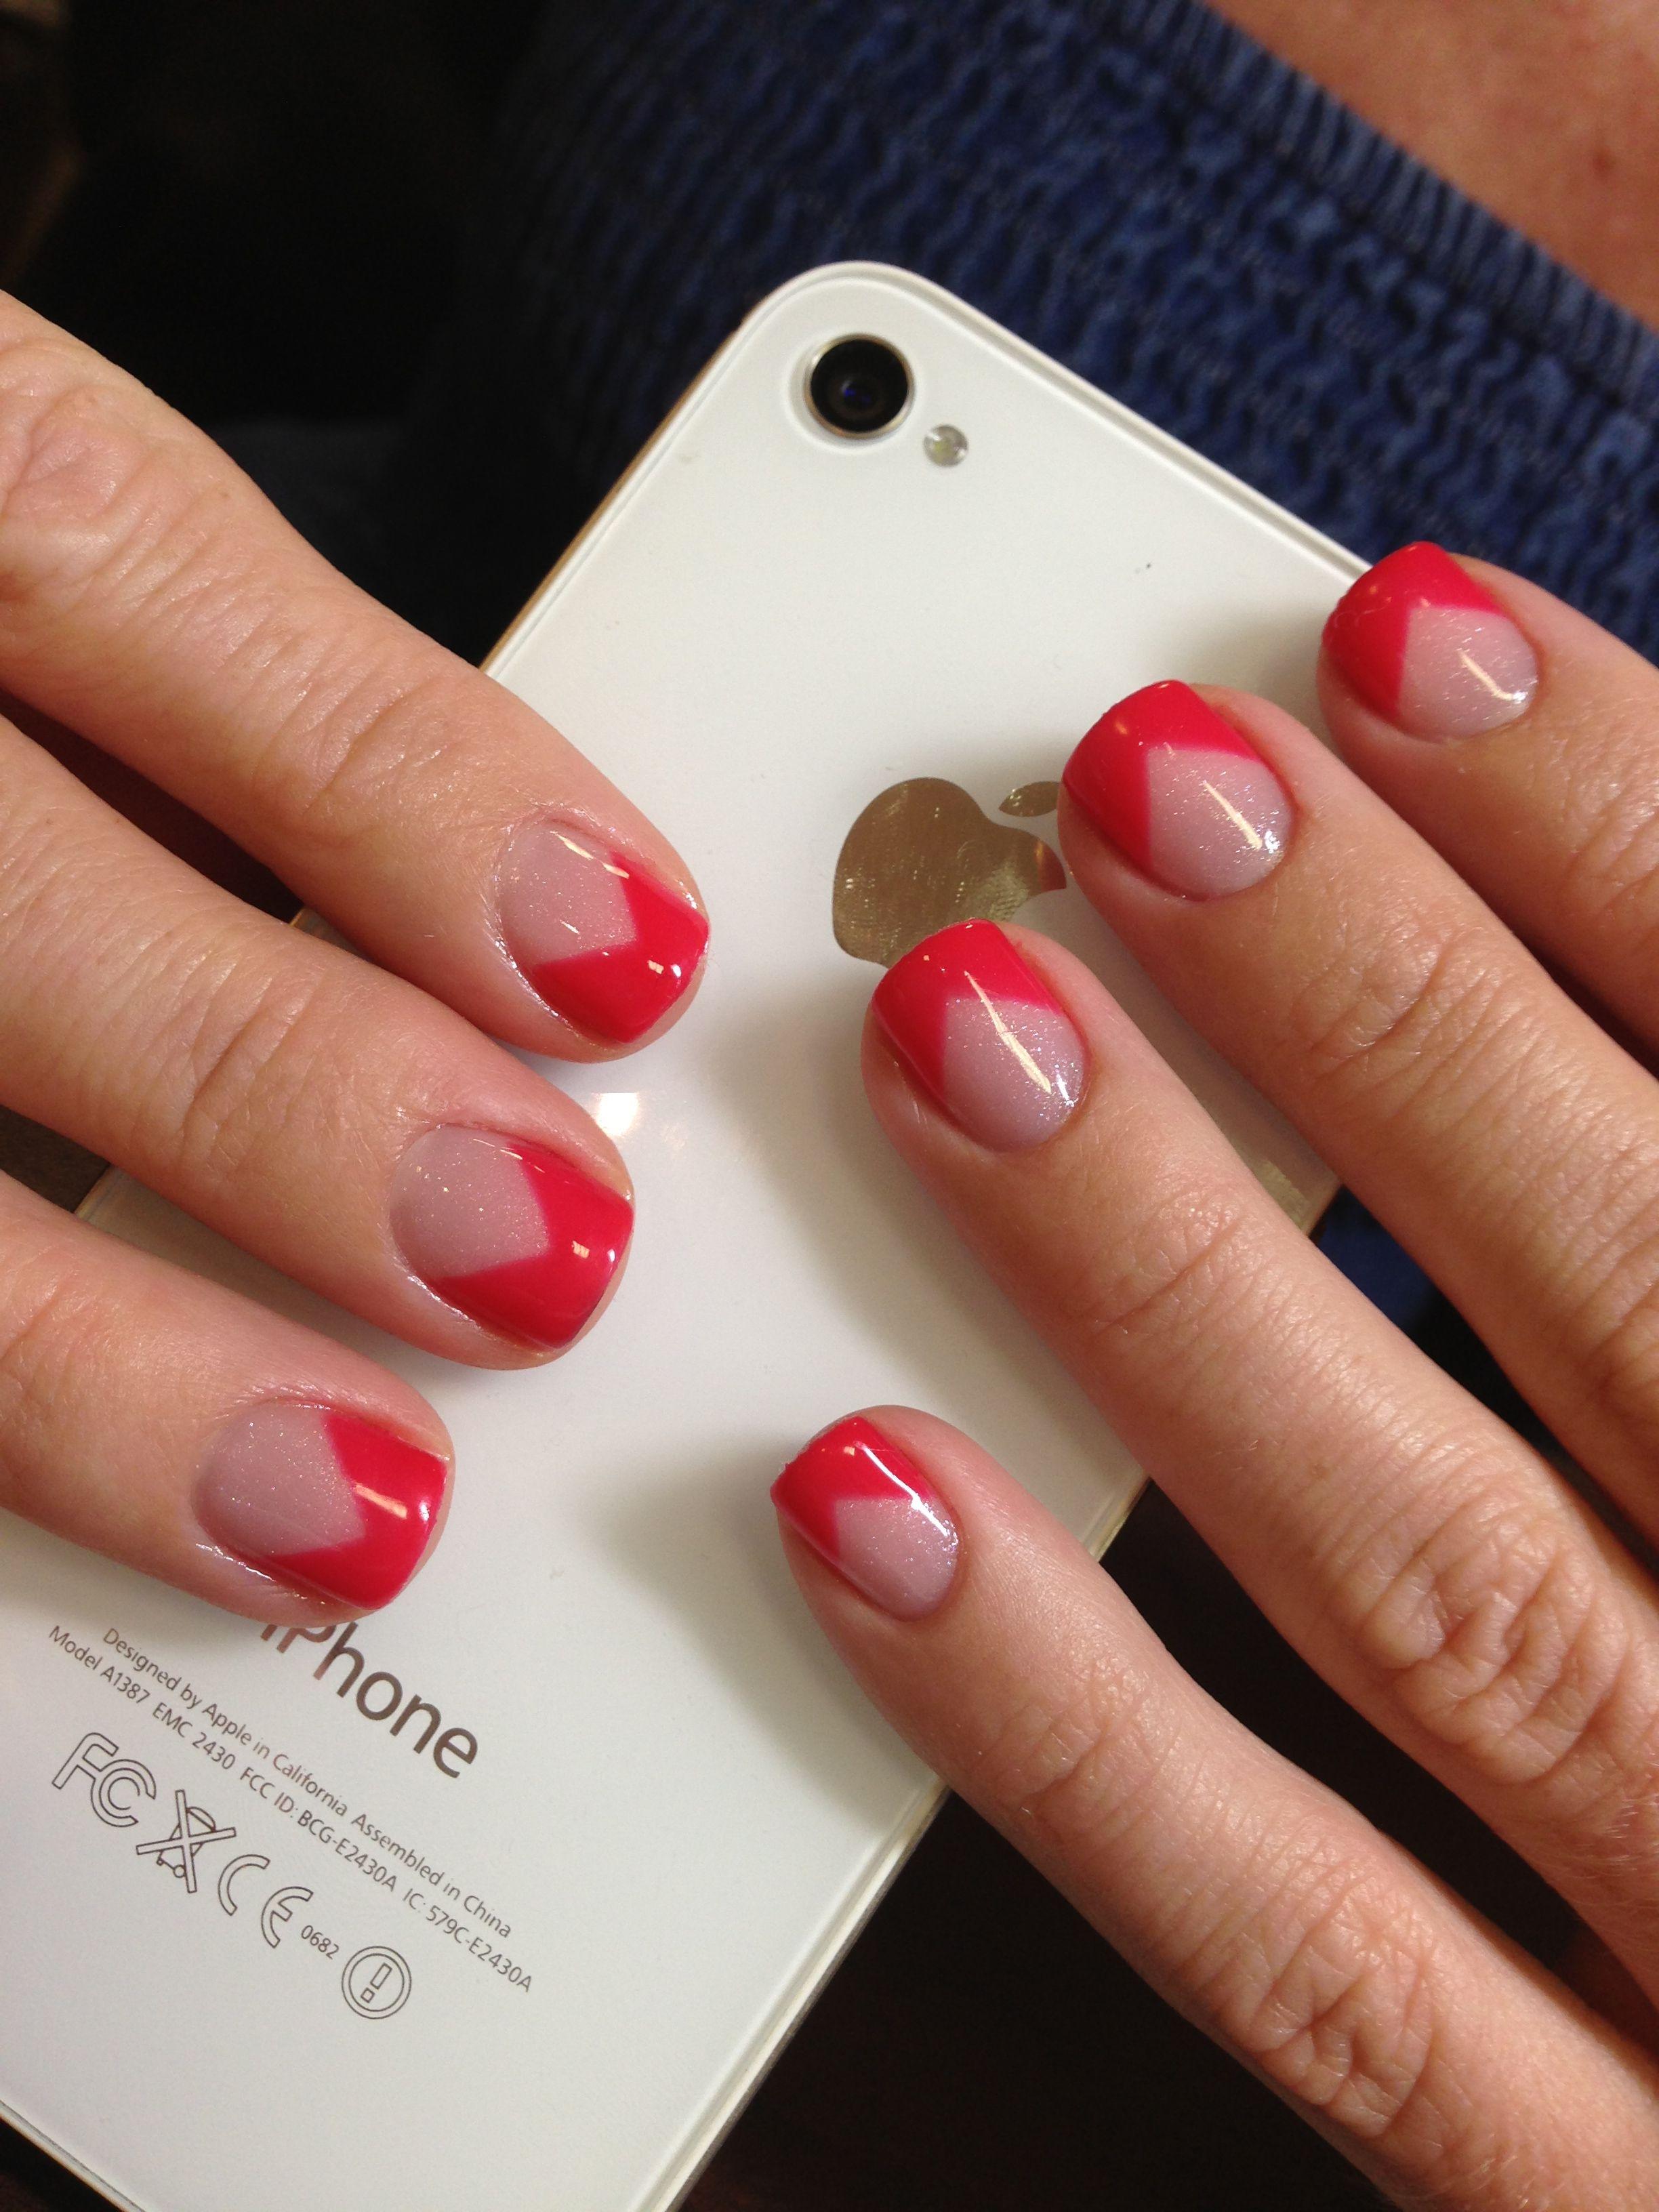 Shellac cnd nails nails by edge salon cape coral florida shellac cnd nails prinsesfo Images